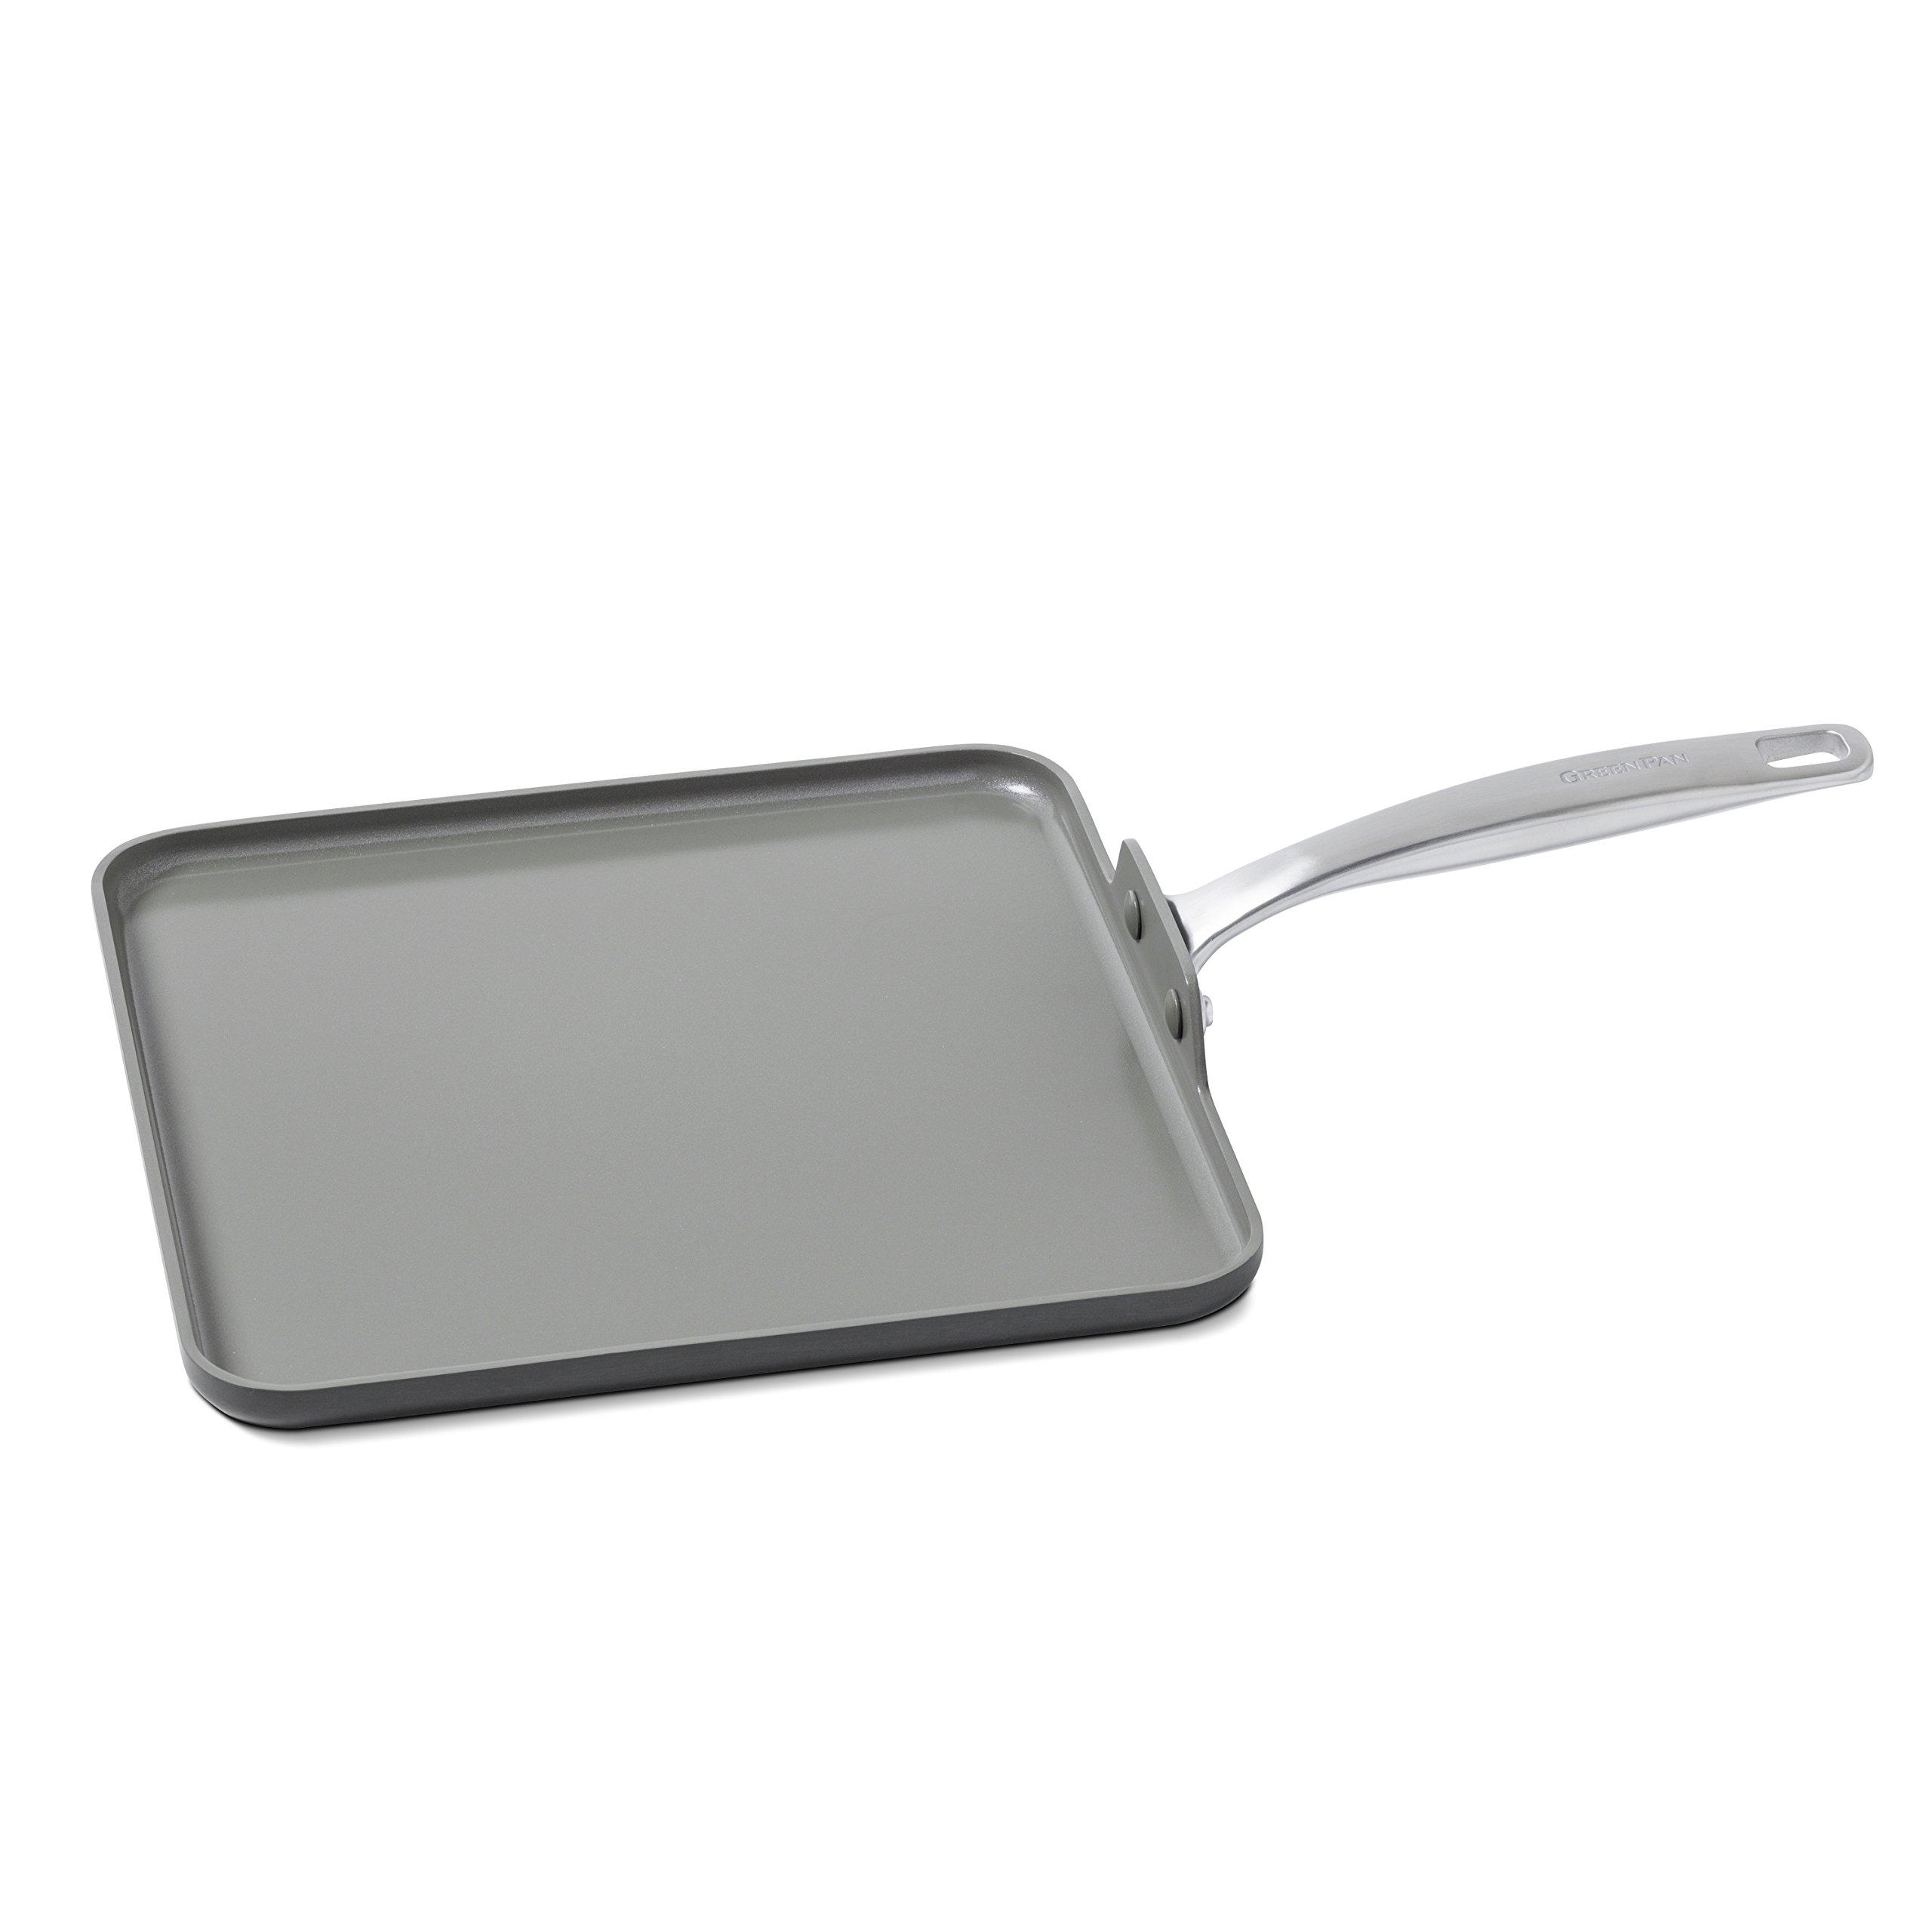 GreenPan Chatham 11'' Ceramic Non-Stick Square Griddle, Grey